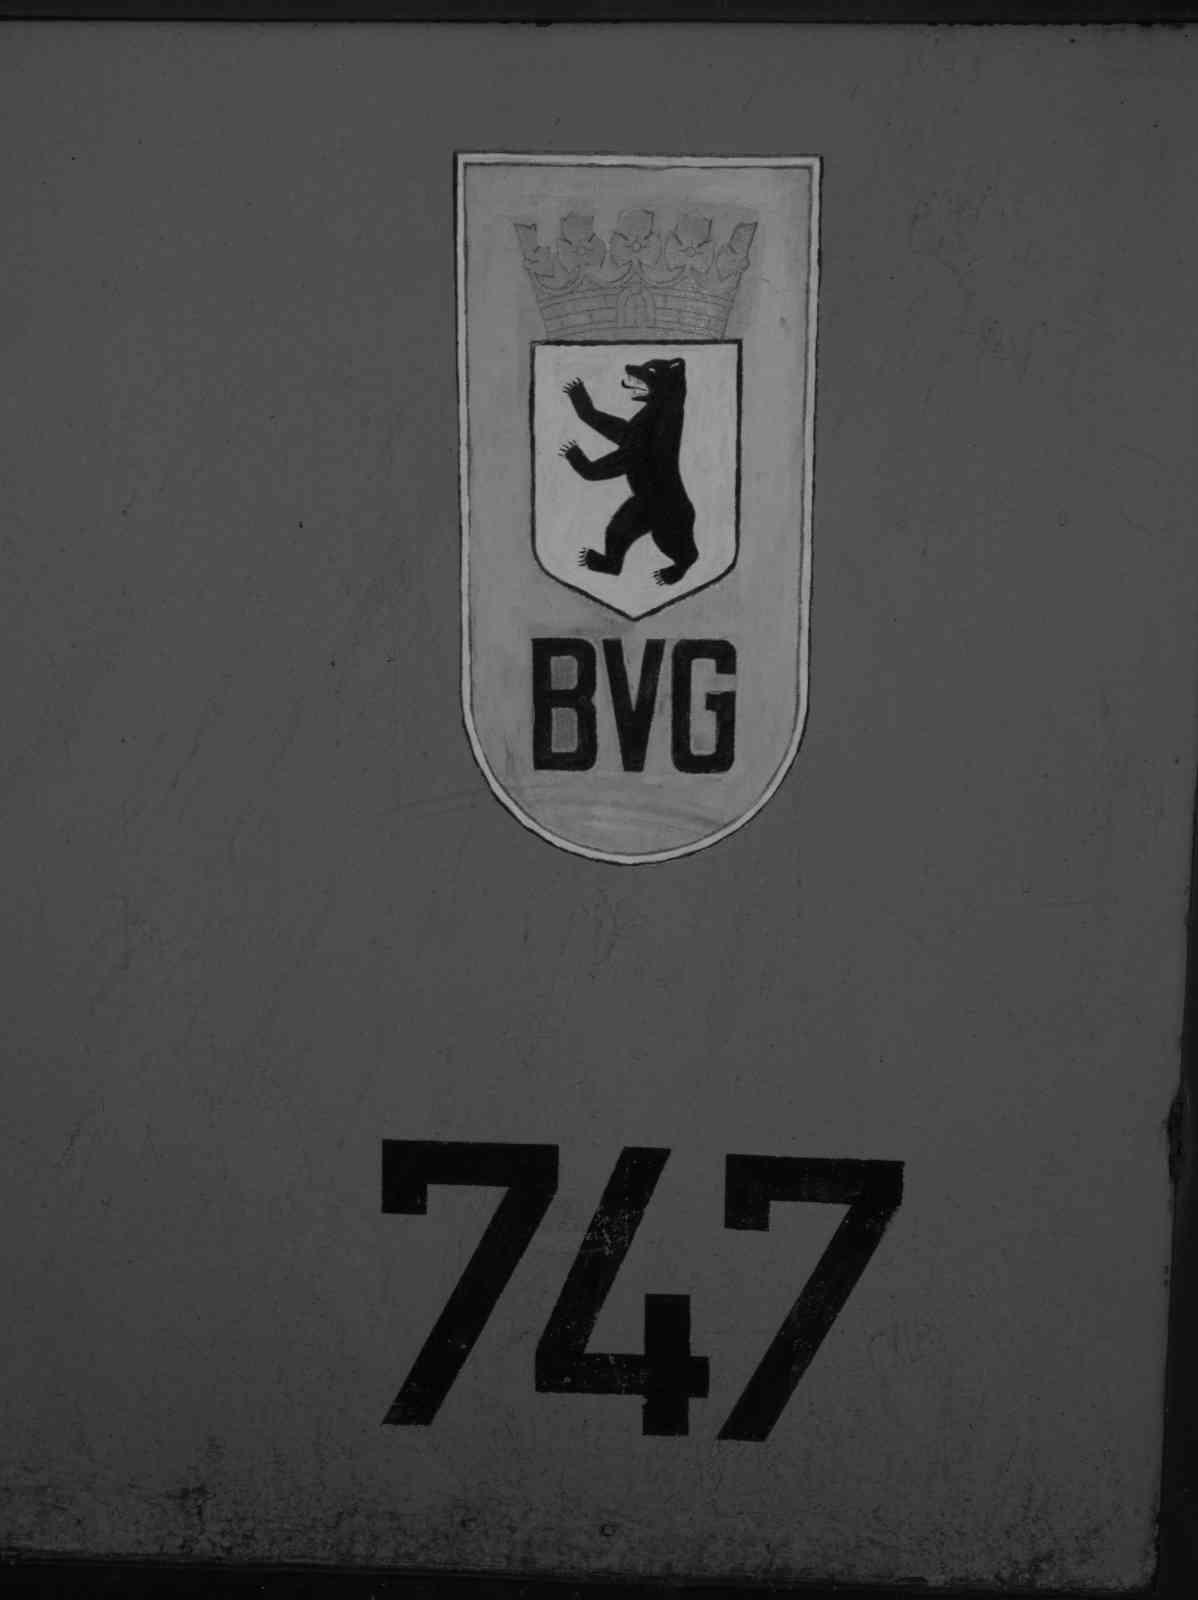 Berliner Straßenbahn - Wagen 747